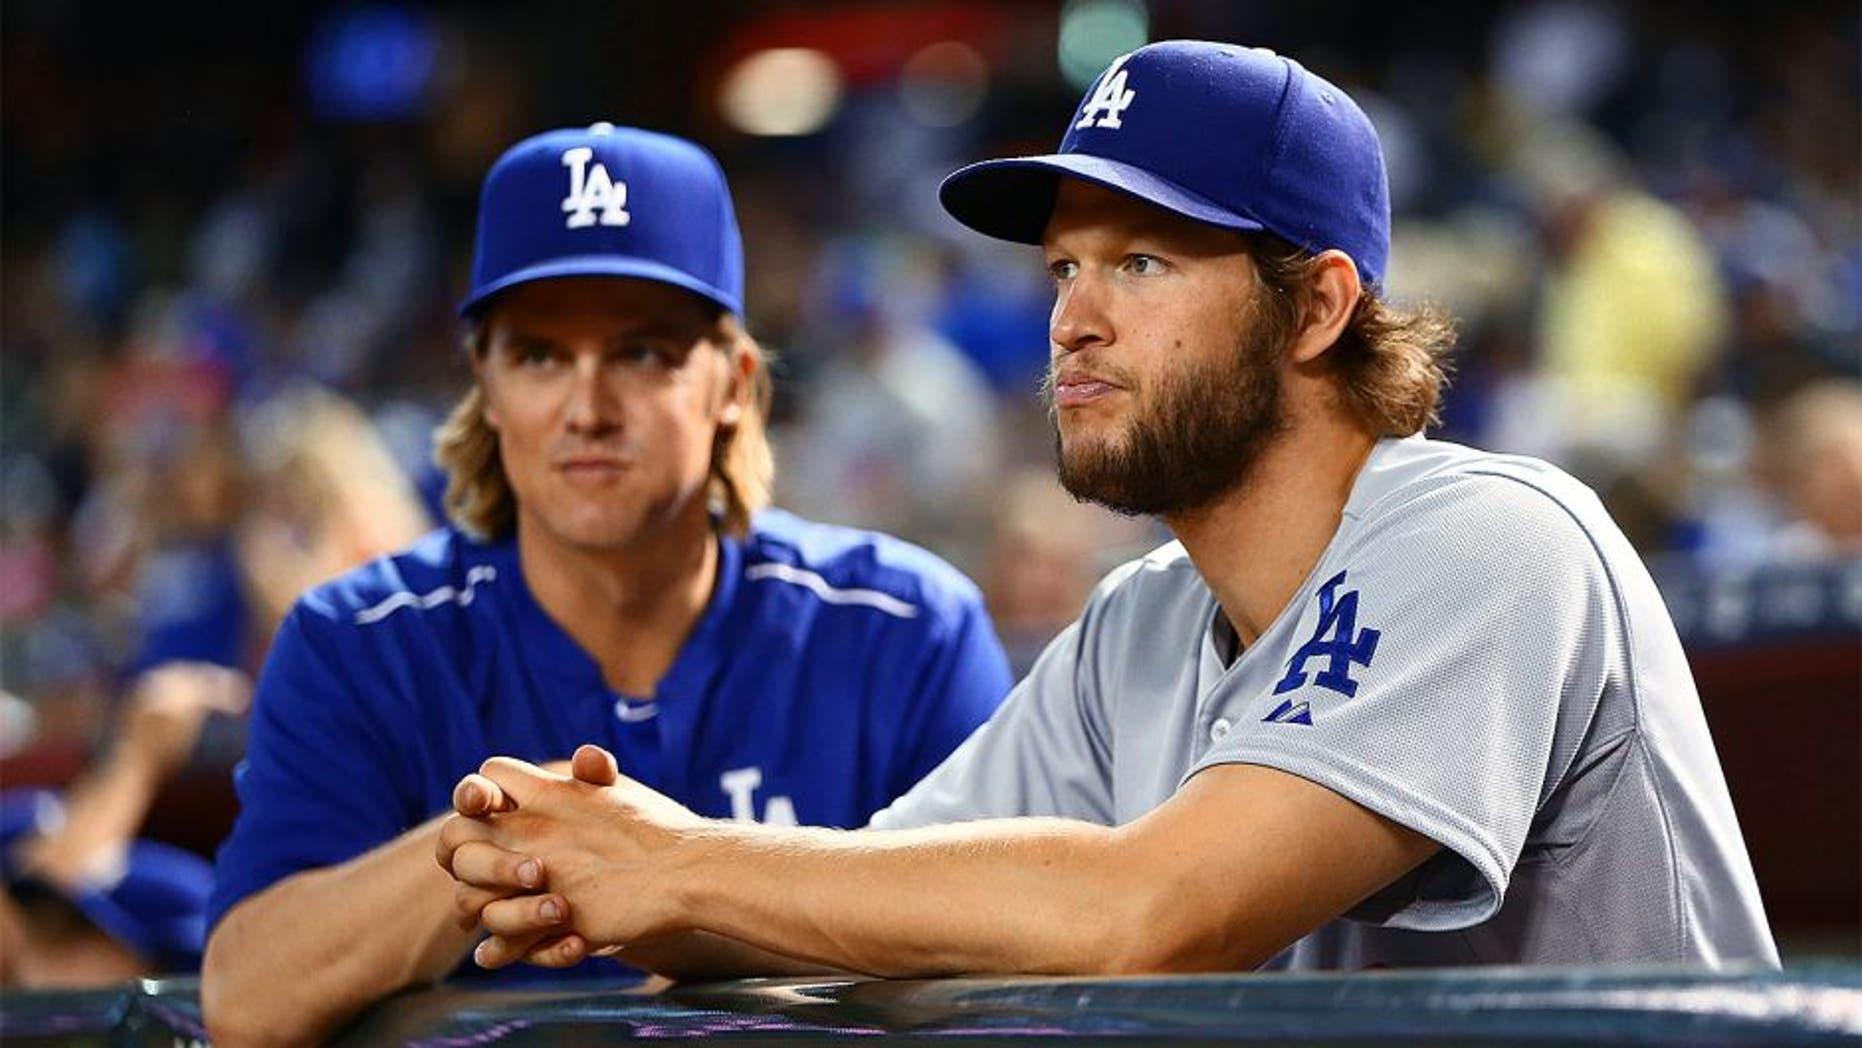 Jun 29, 2015; Phoenix, AZ, USA; Los Angeles Dodgers pitcher Clayton Kershaw (right) and Zack Greinke in the first inning against the Arizona Diamondbacks at Chase Field. Mandatory Credit: Mark J. Rebilas-USA TODAY Sports